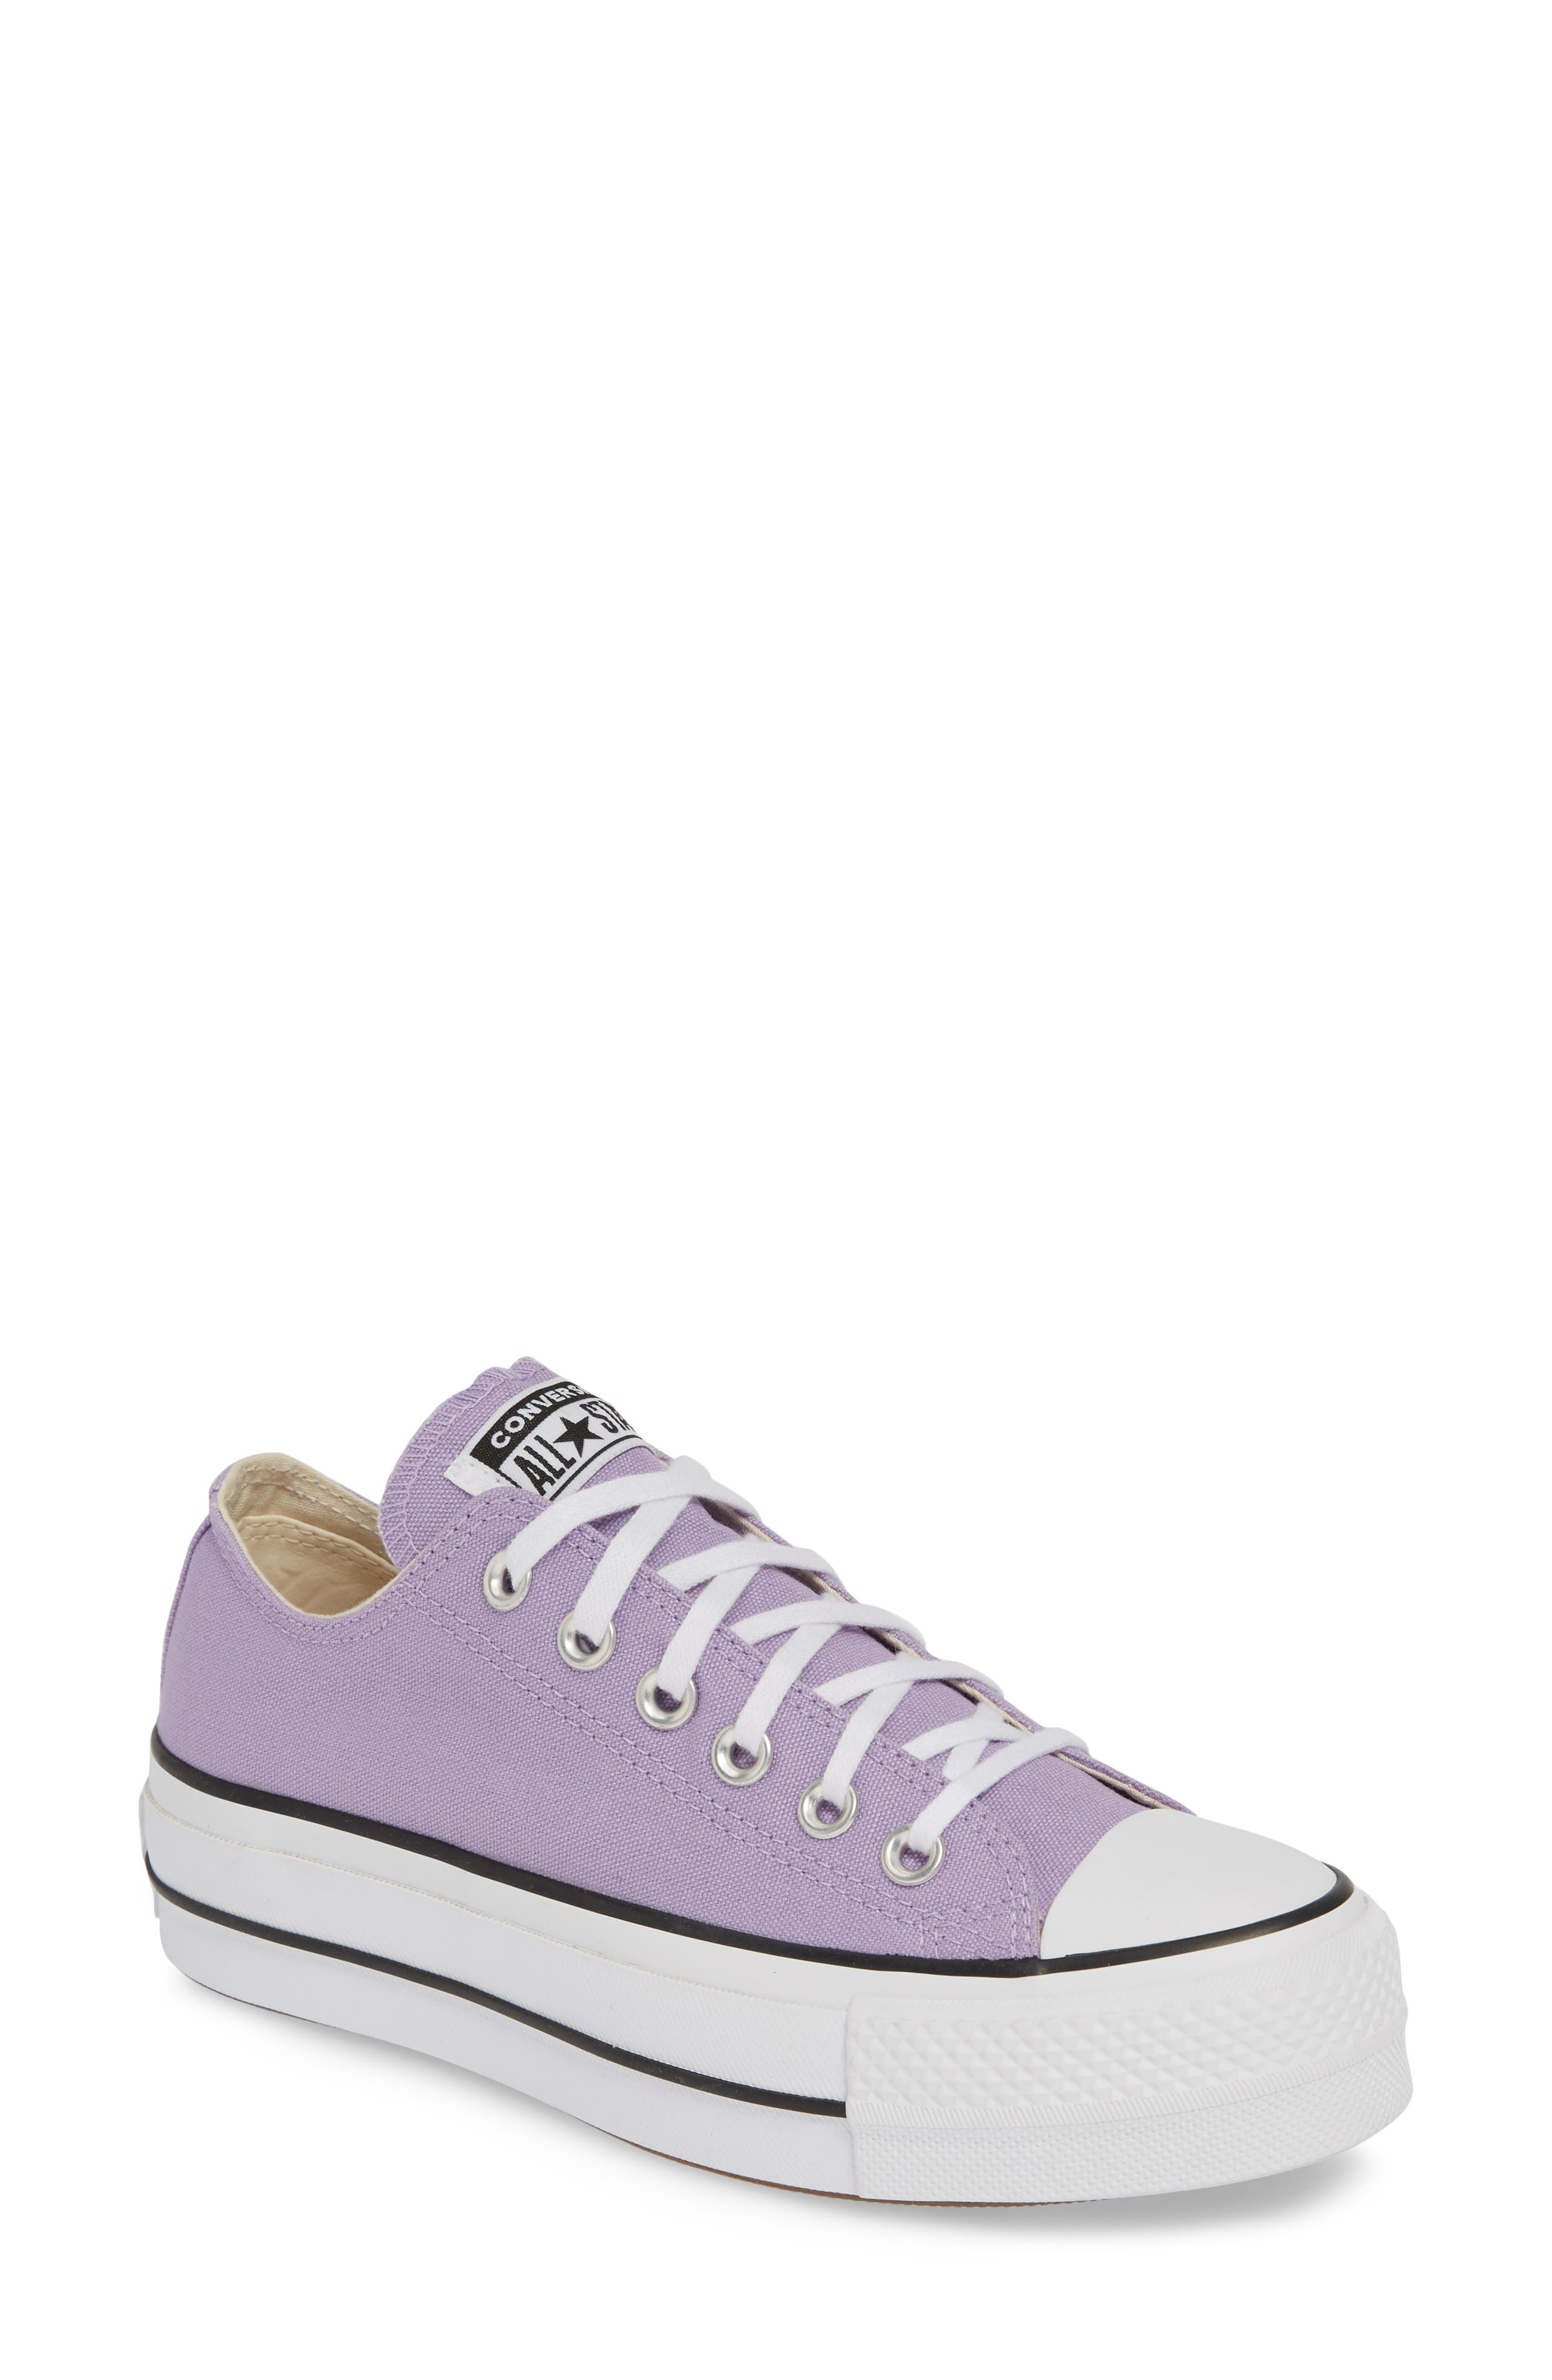 Converse Chuck Taylor All Star Platform Sneaker, Purple